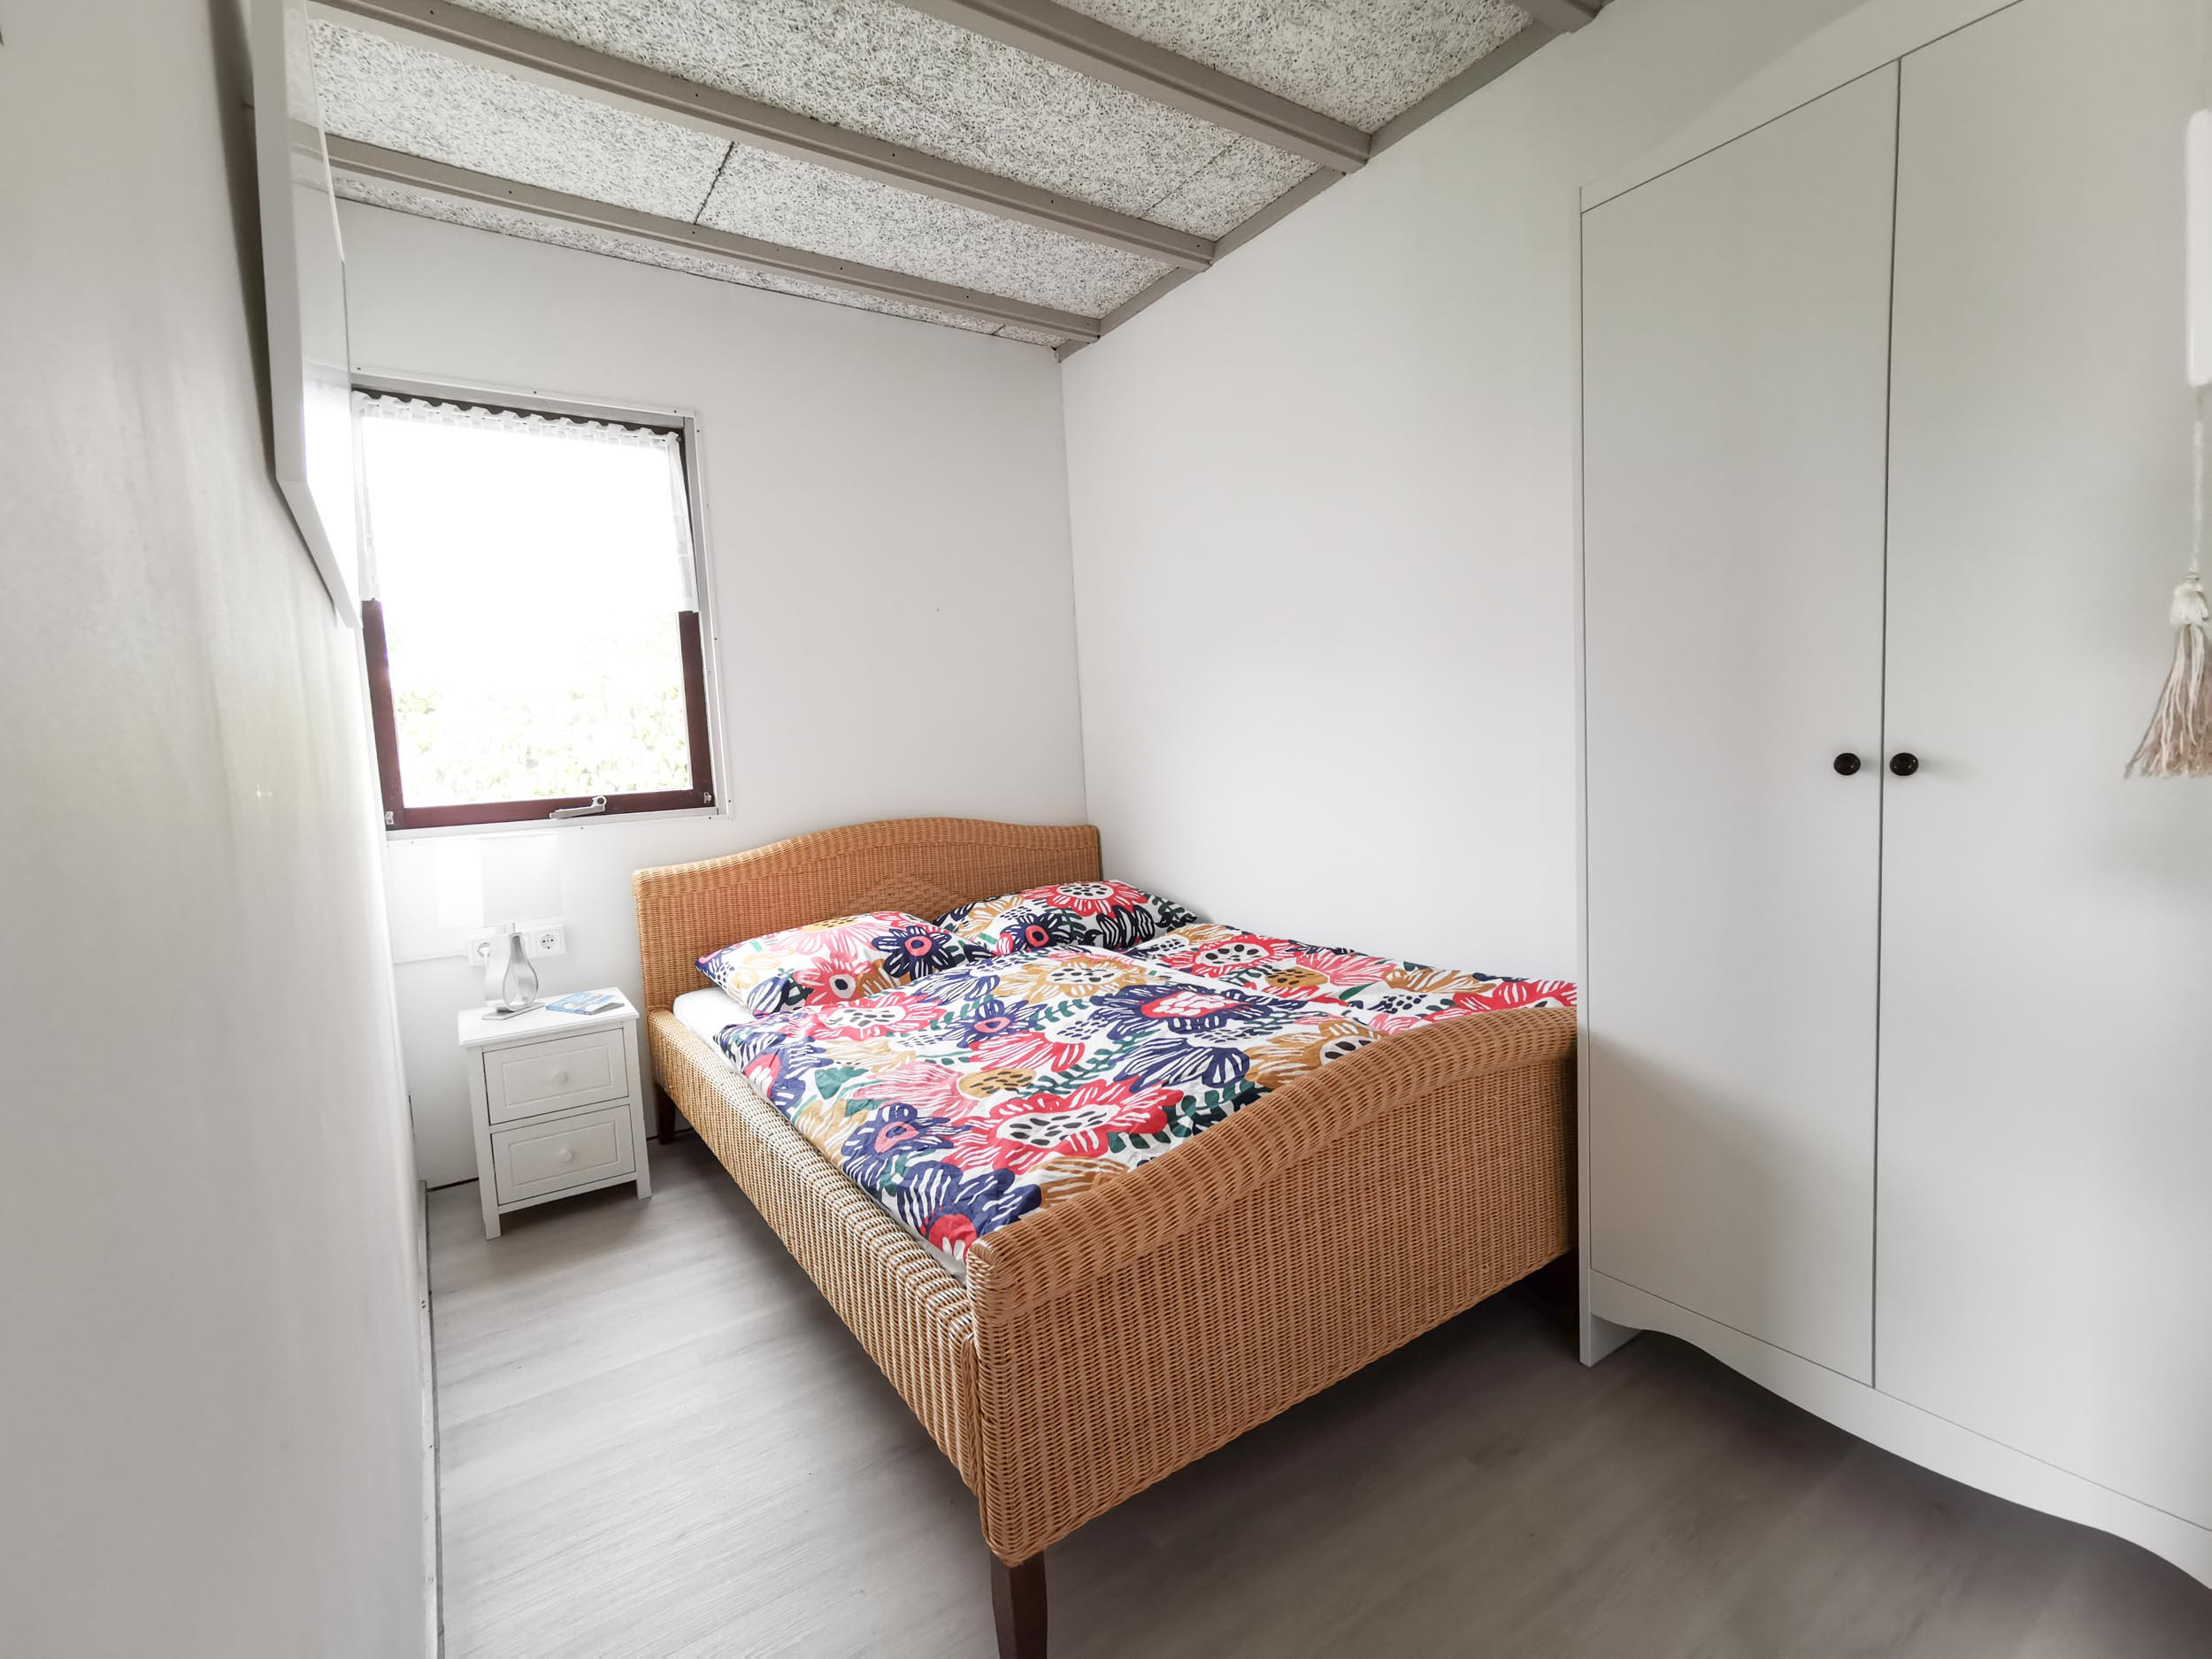 Schlafzimmer 2 Ferienhaus Sint Maartensvlotbrug Nordholland